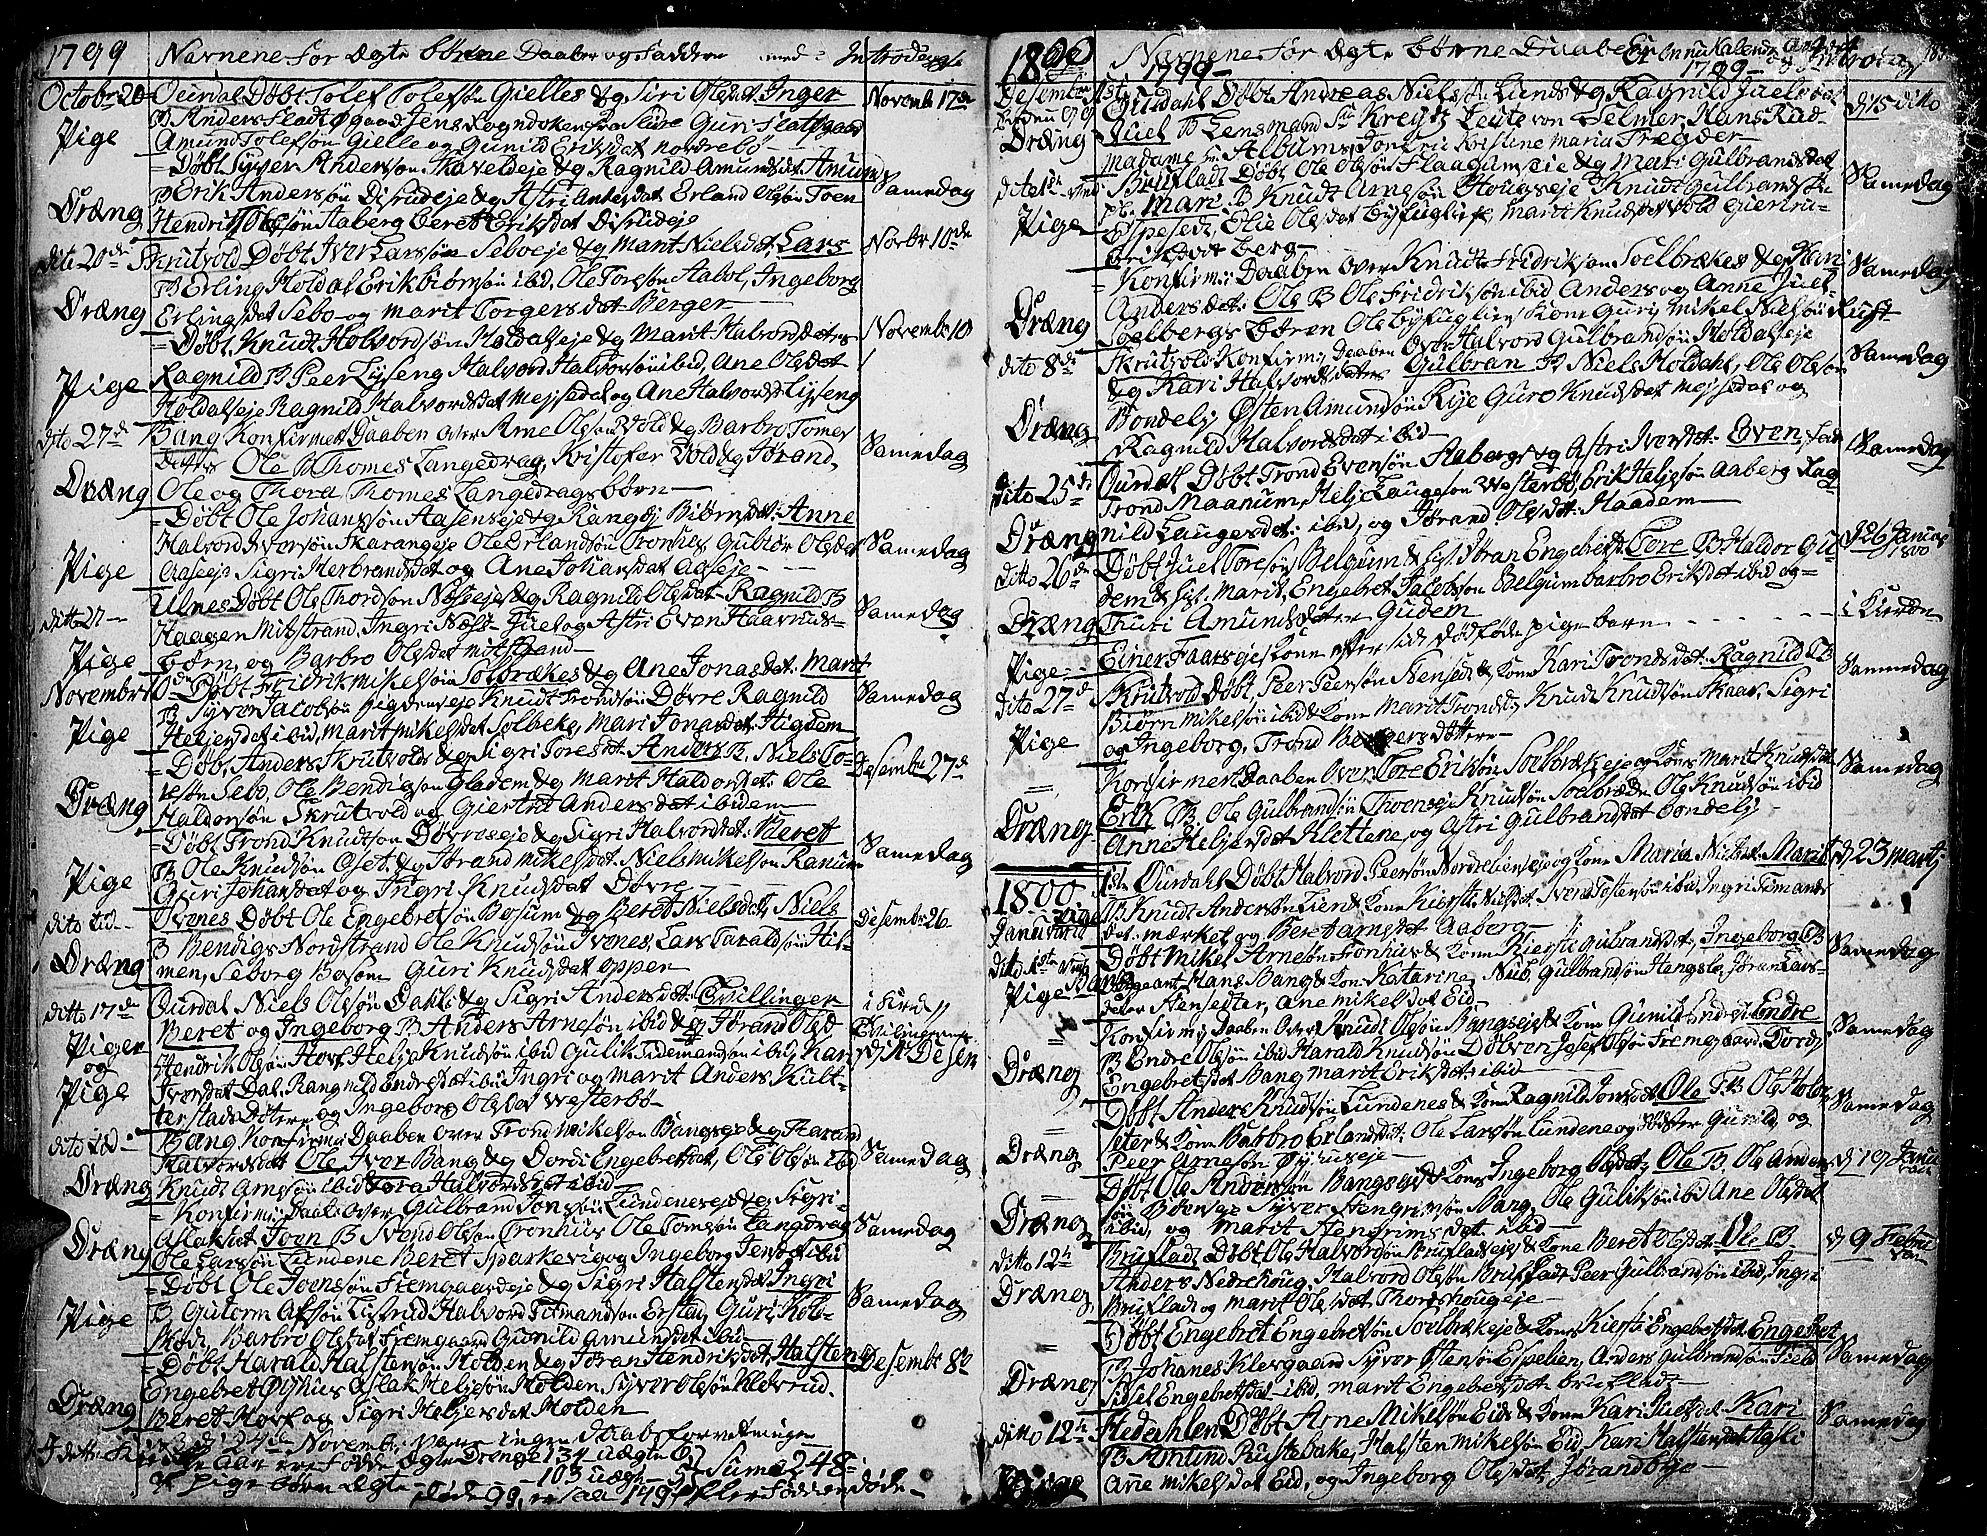 SAH, Aurdal prestekontor, Ministerialbok nr. 6, 1781-1804, s. 185